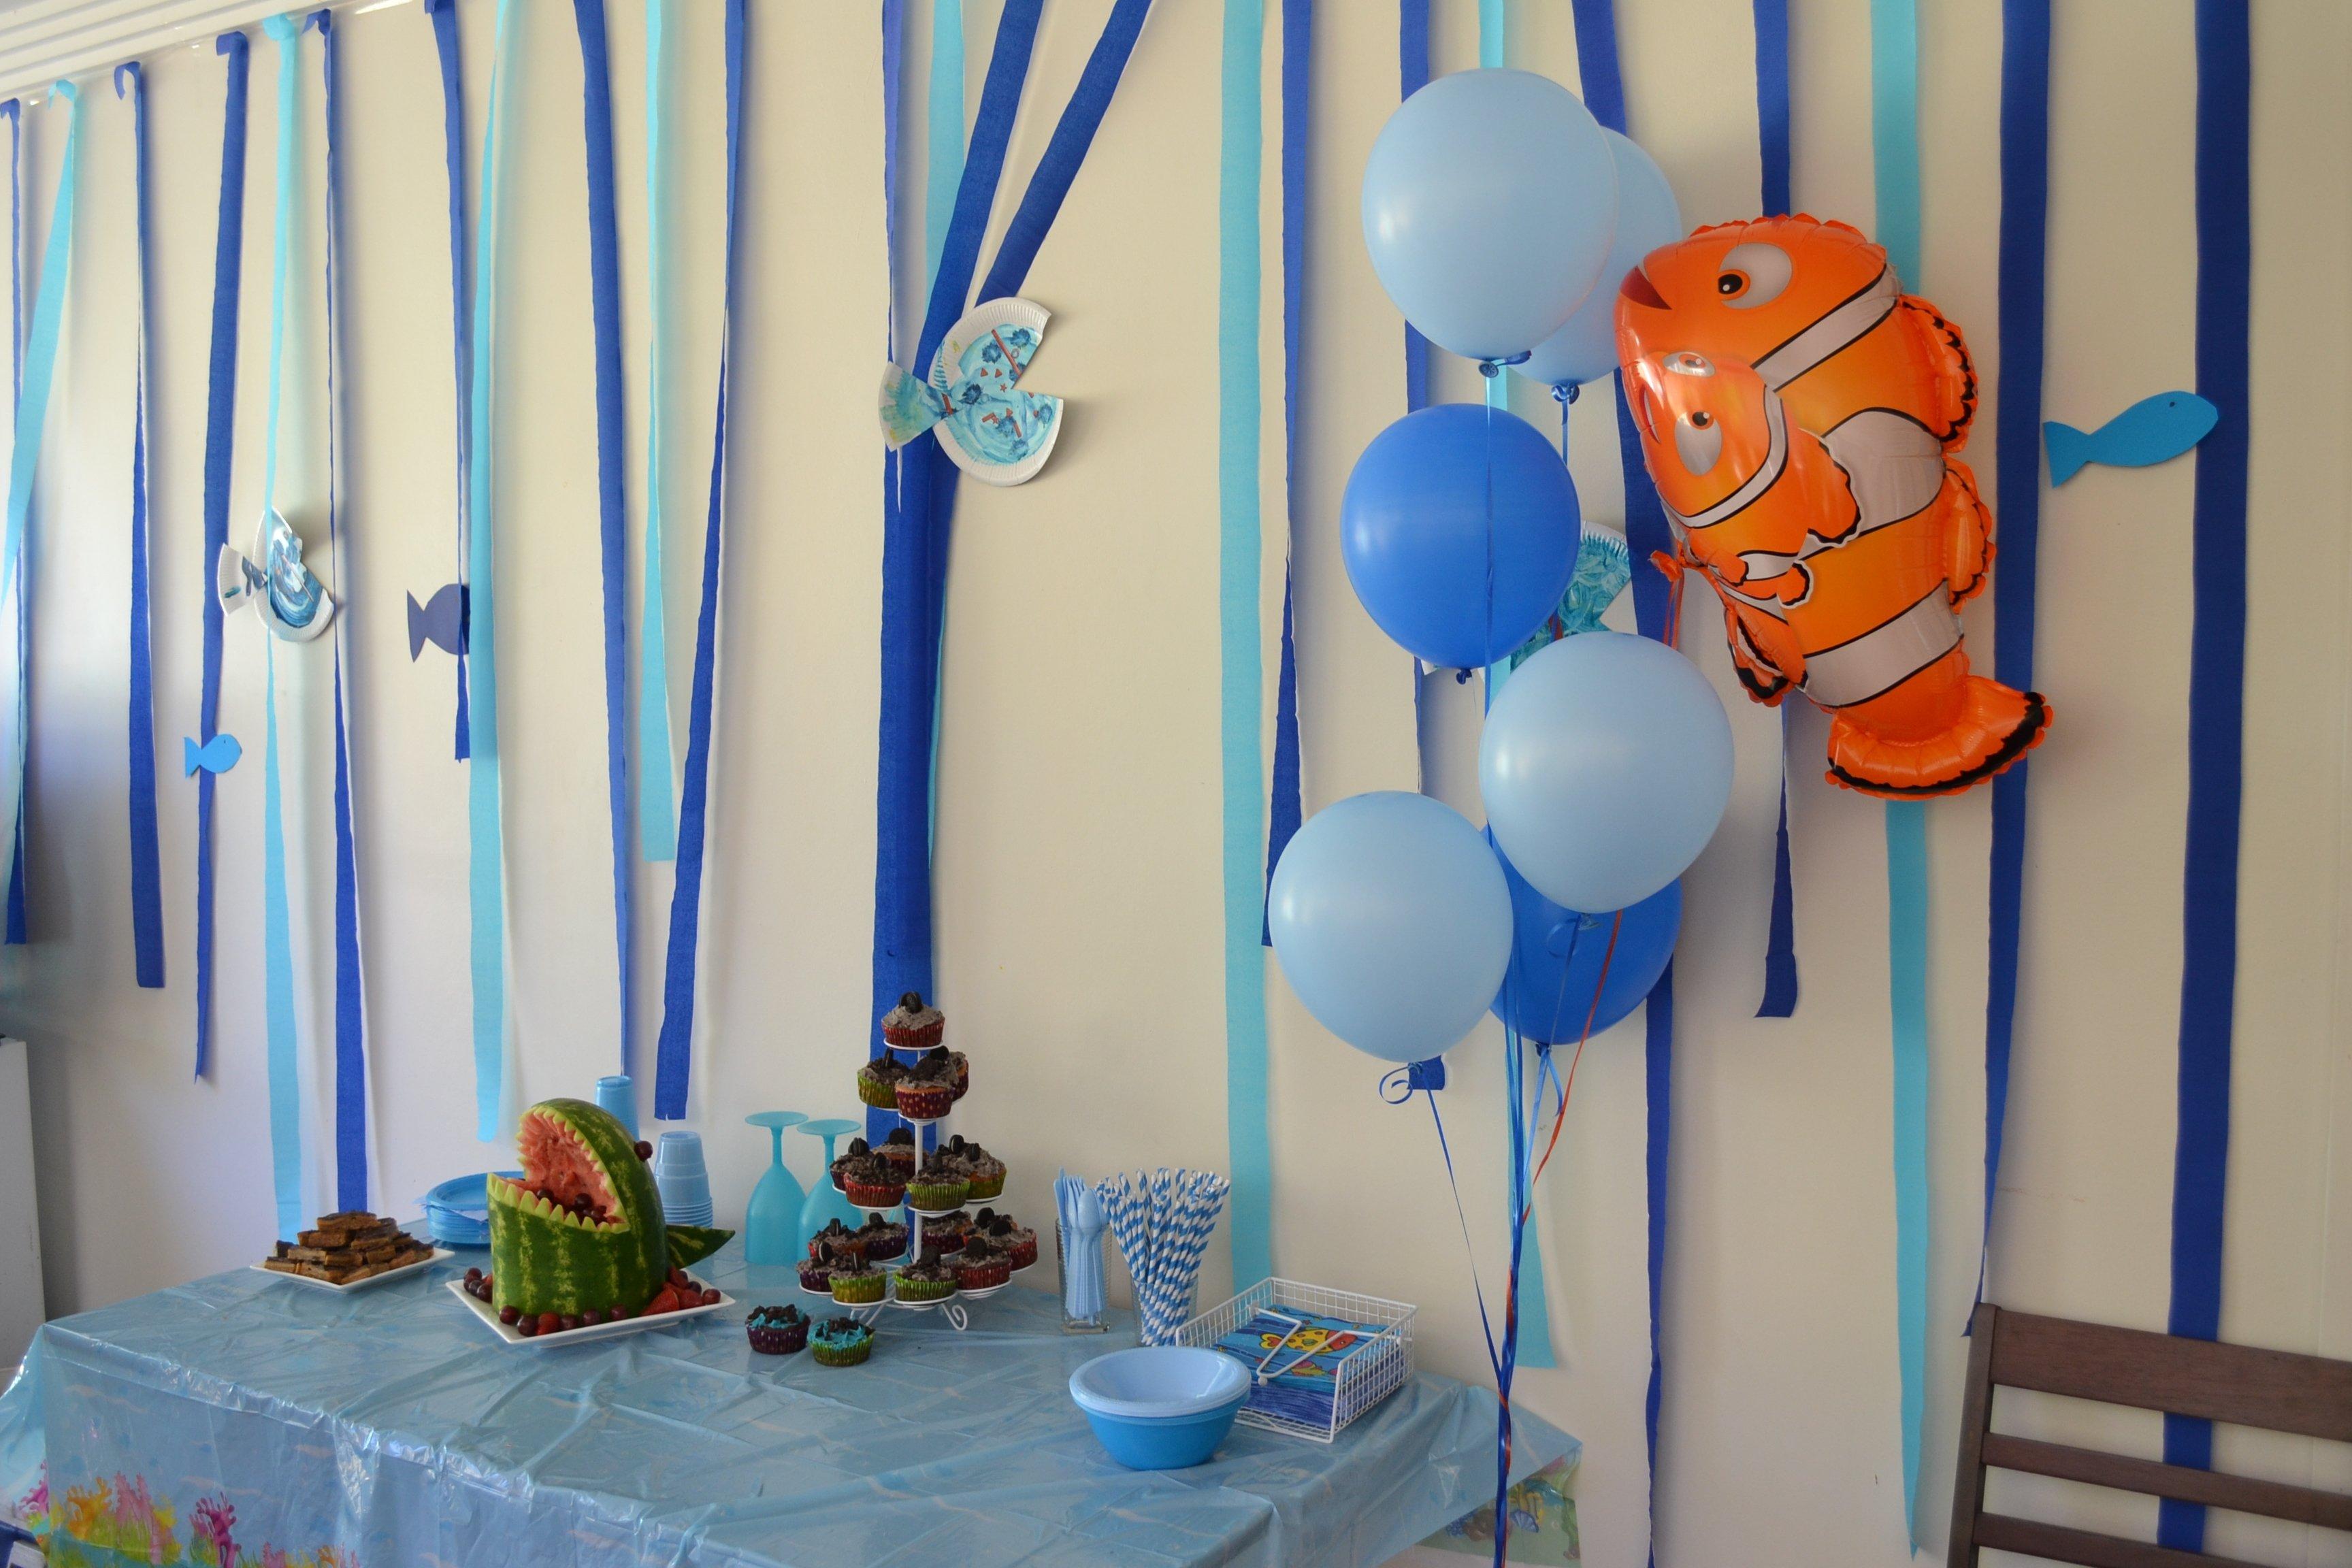 10 Stylish Finding Nemo Birthday Party Ideas underwater birthday party ideas neatsweetandgeek au 2020